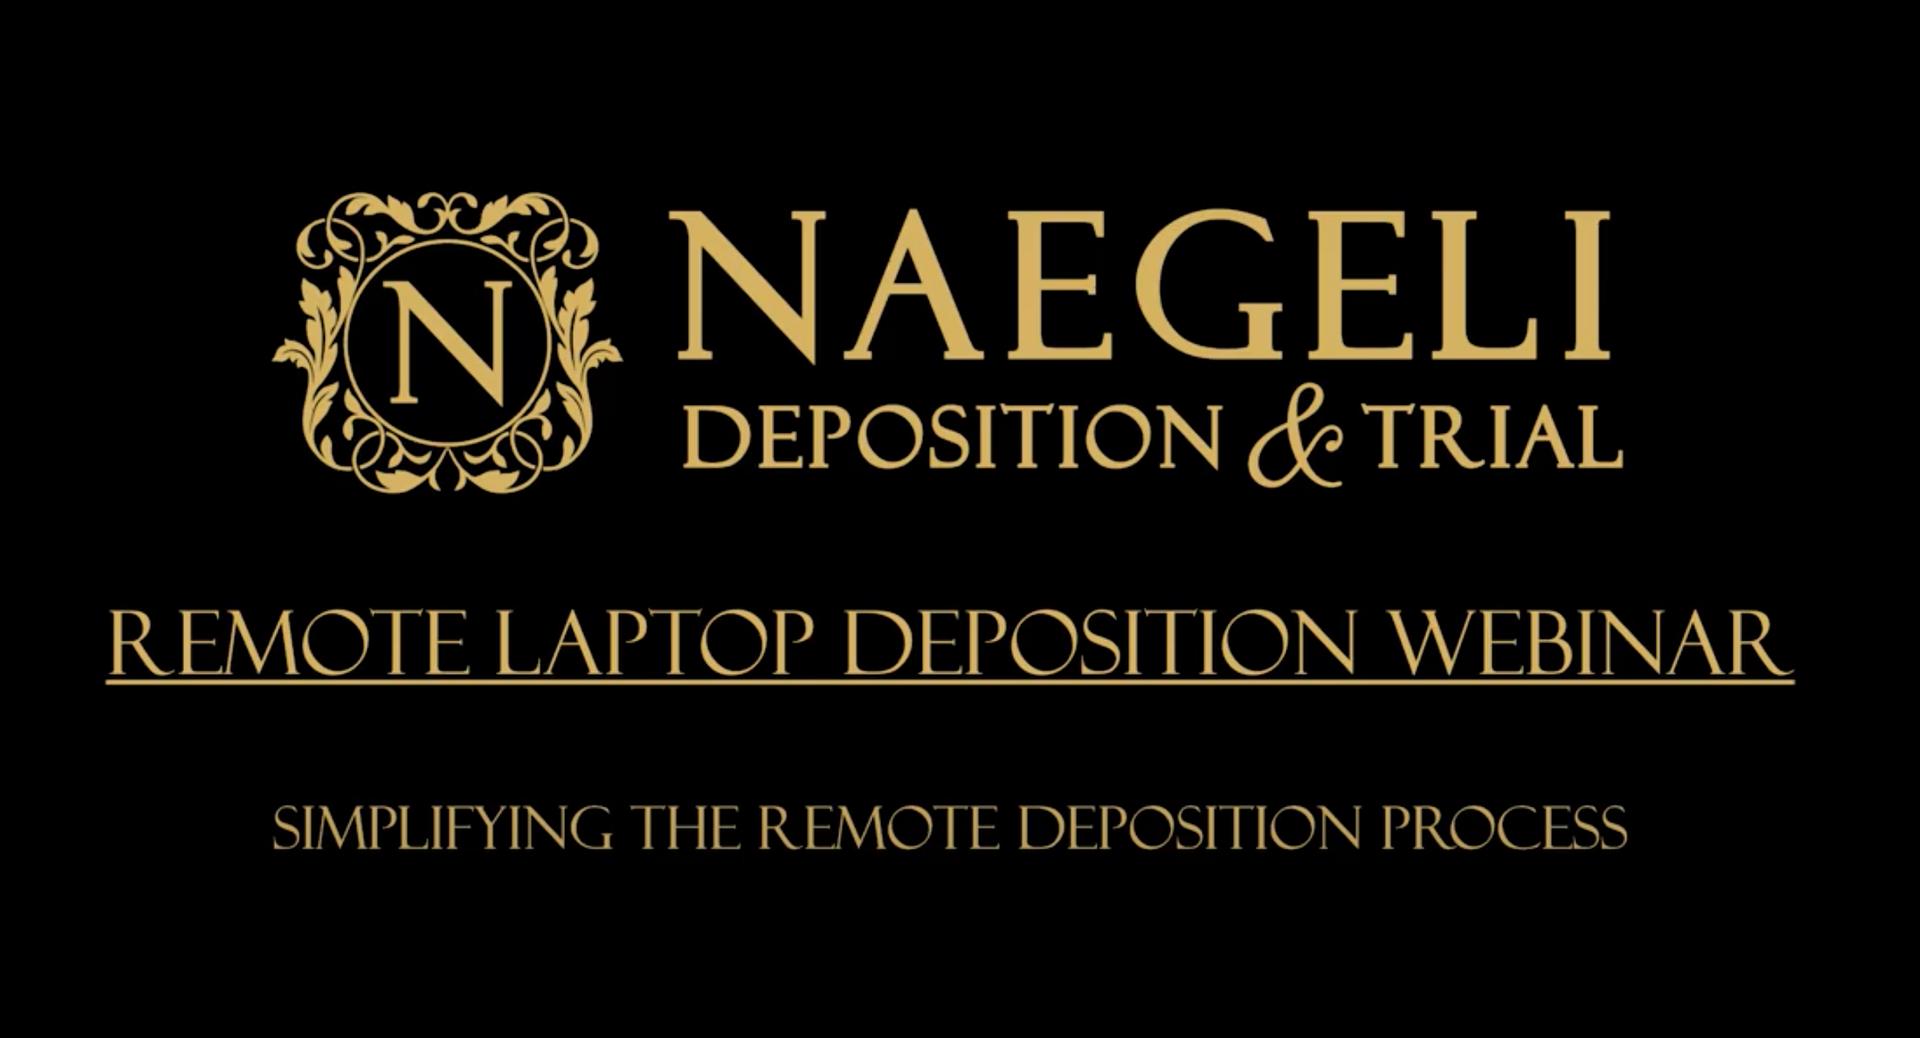 remote_laptop_deposition_webinar